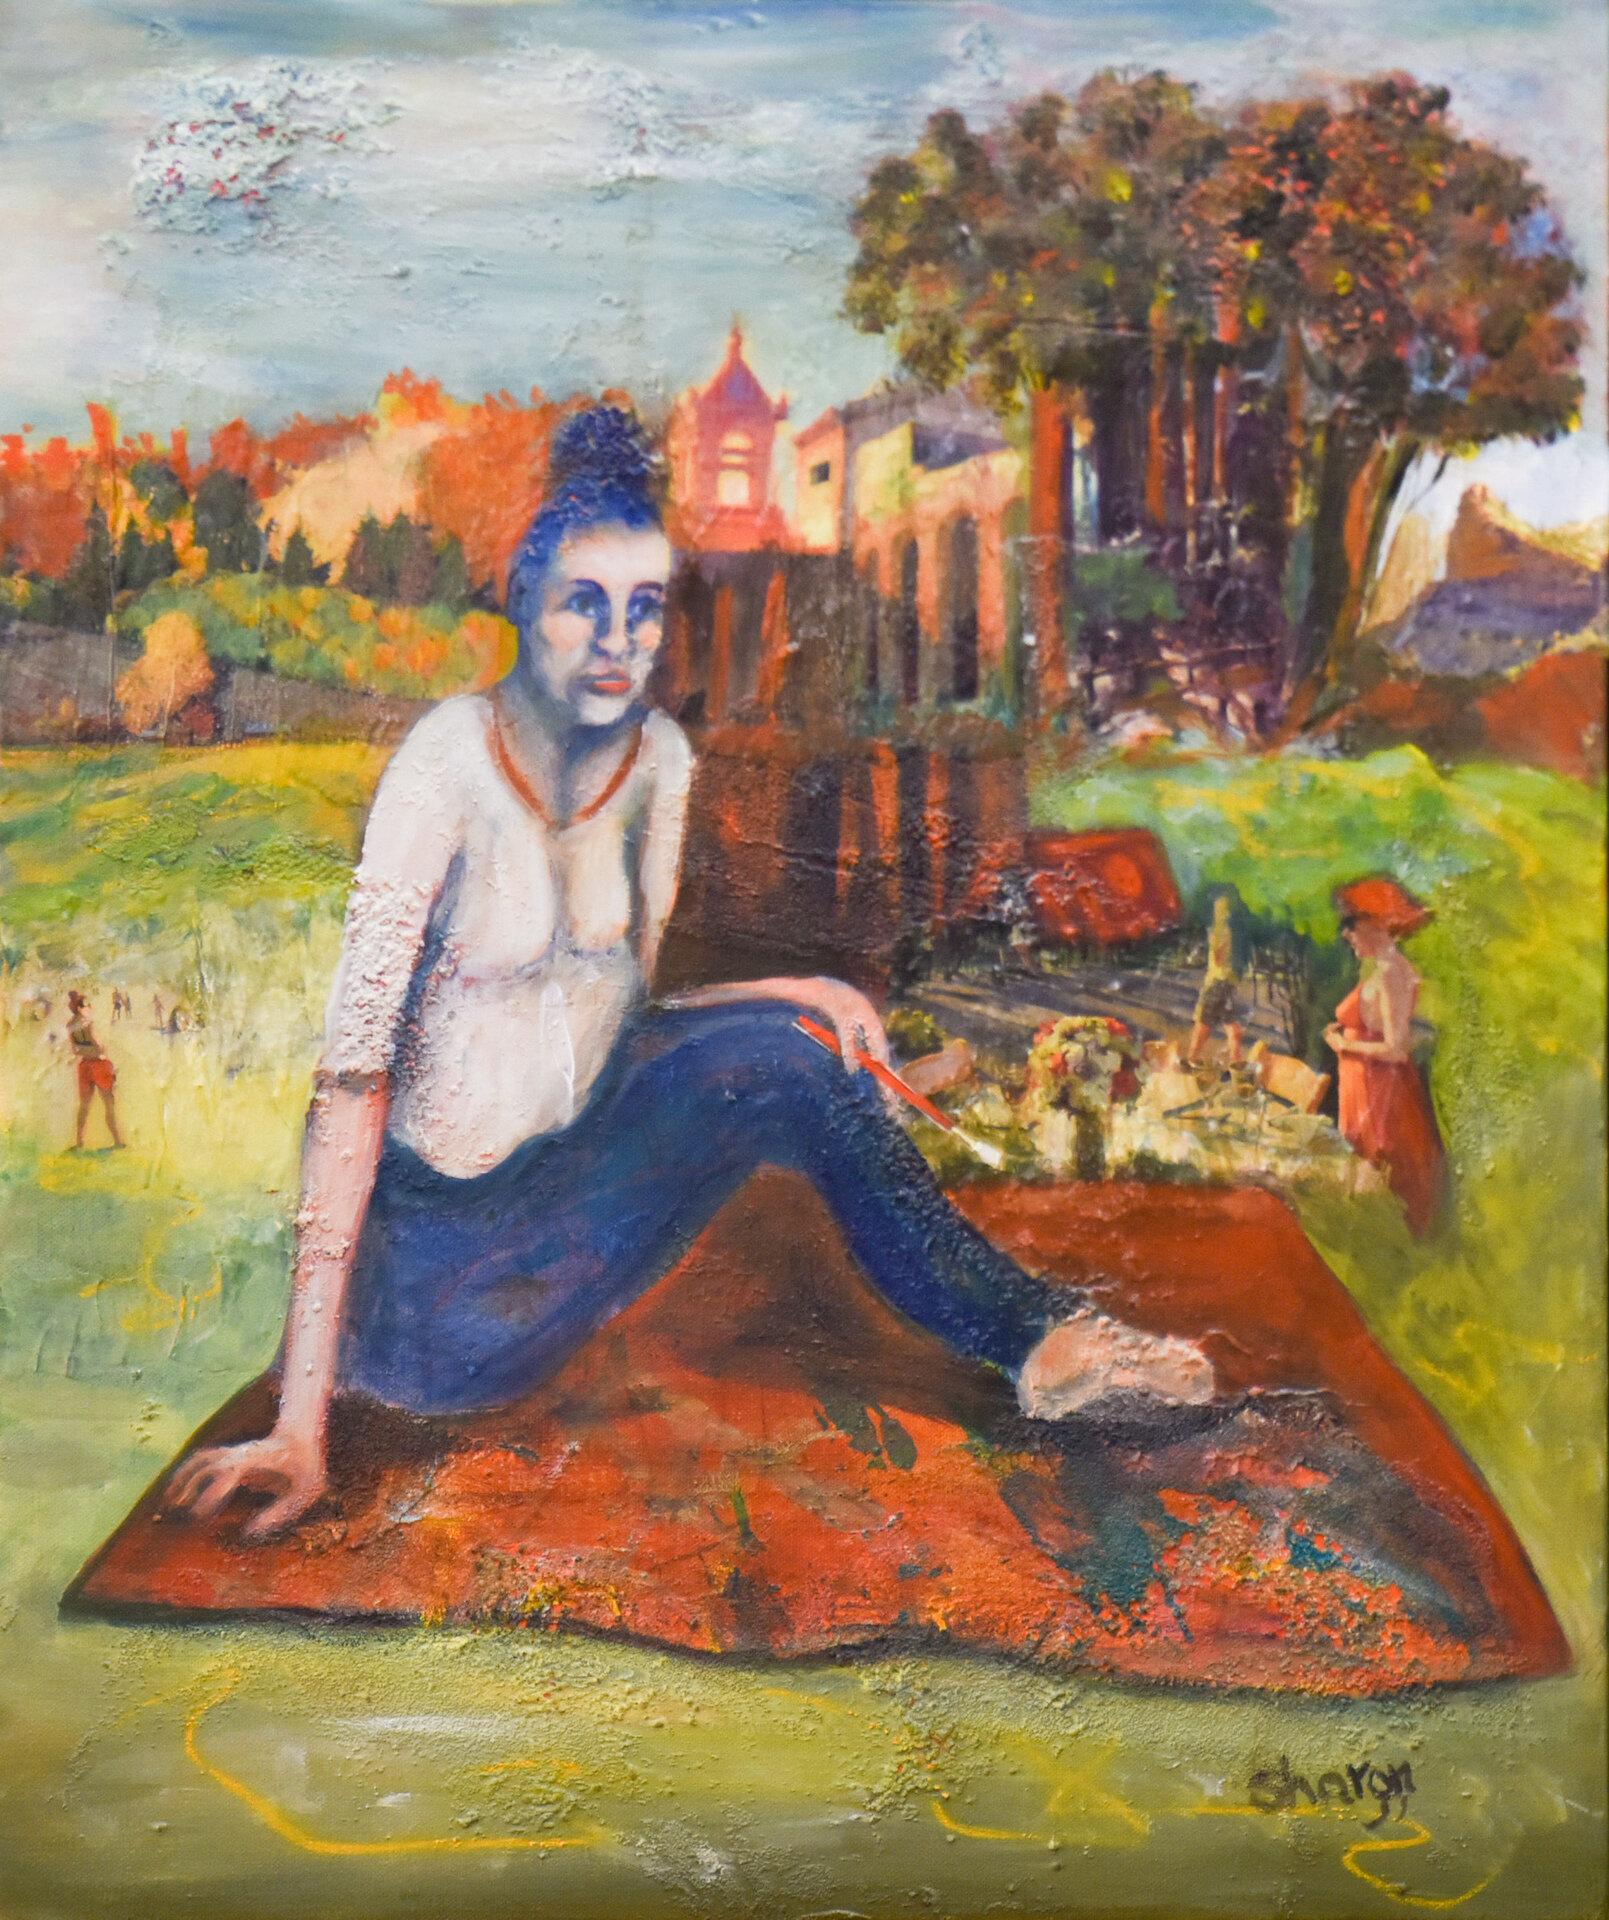 Harris Sharon - A Divided Self